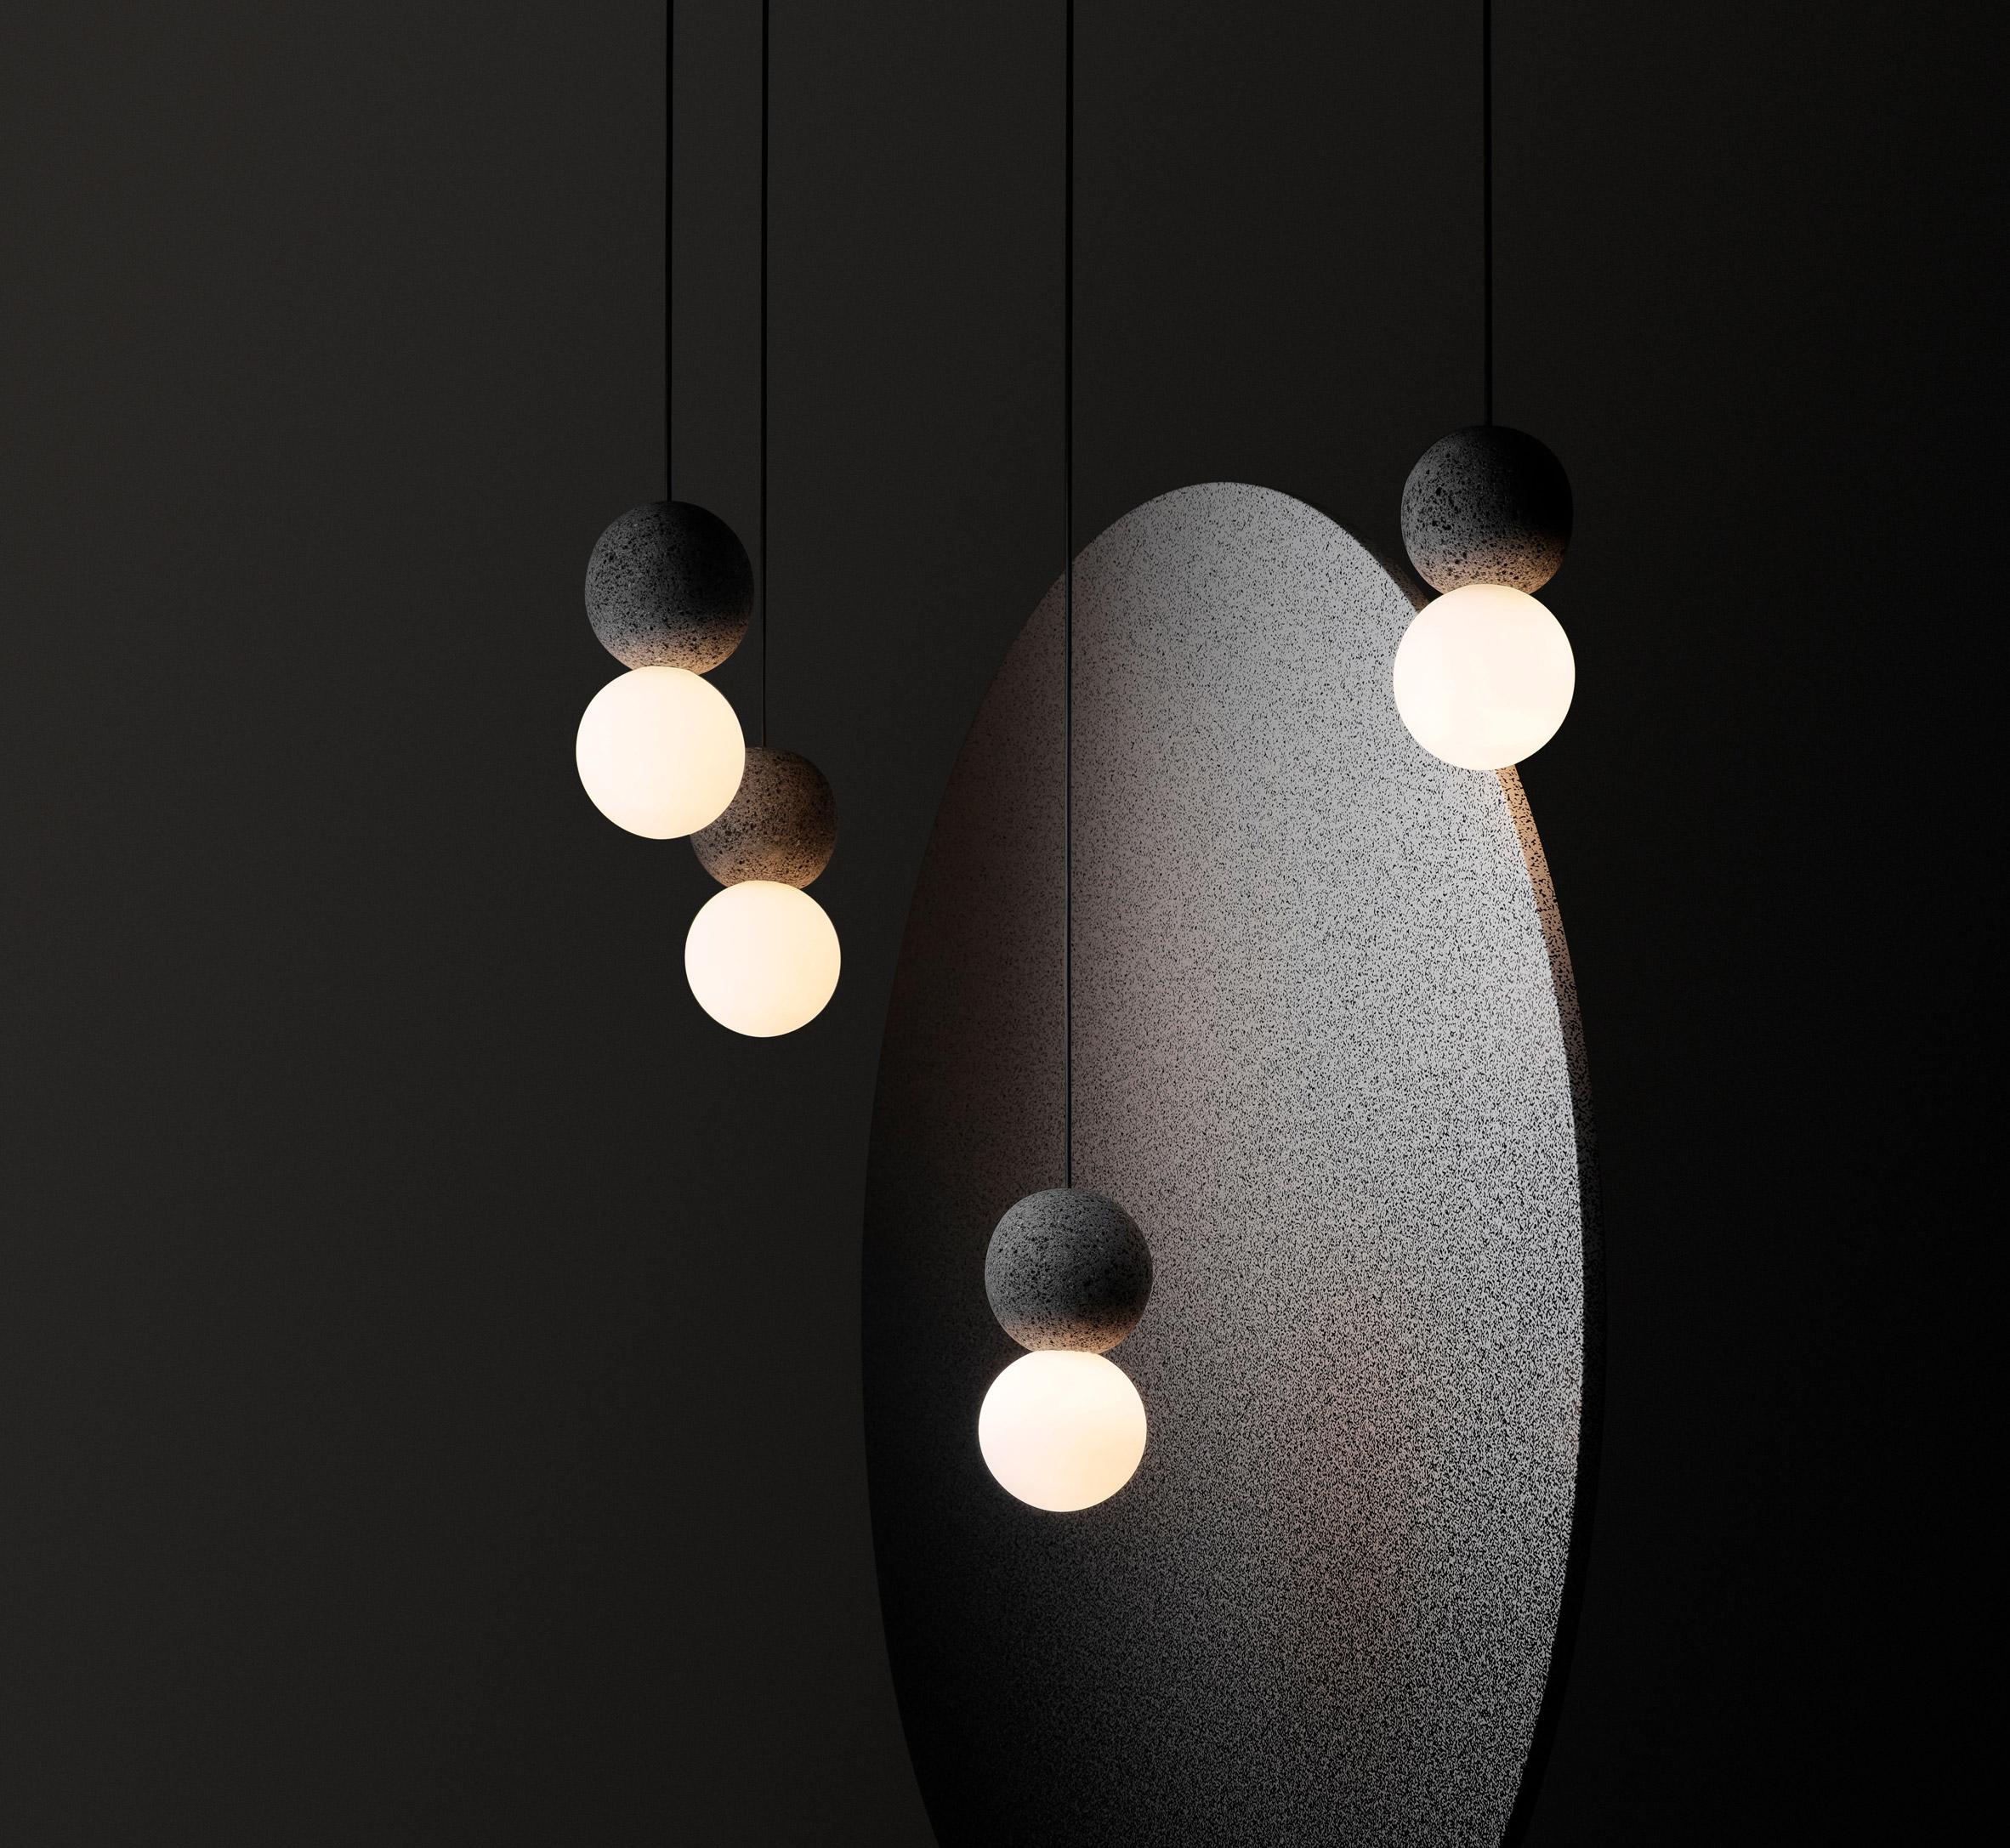 origo-lighting-collection-david-pompa-design-euroluce-milan_dezeen_2364_col_17.jpg